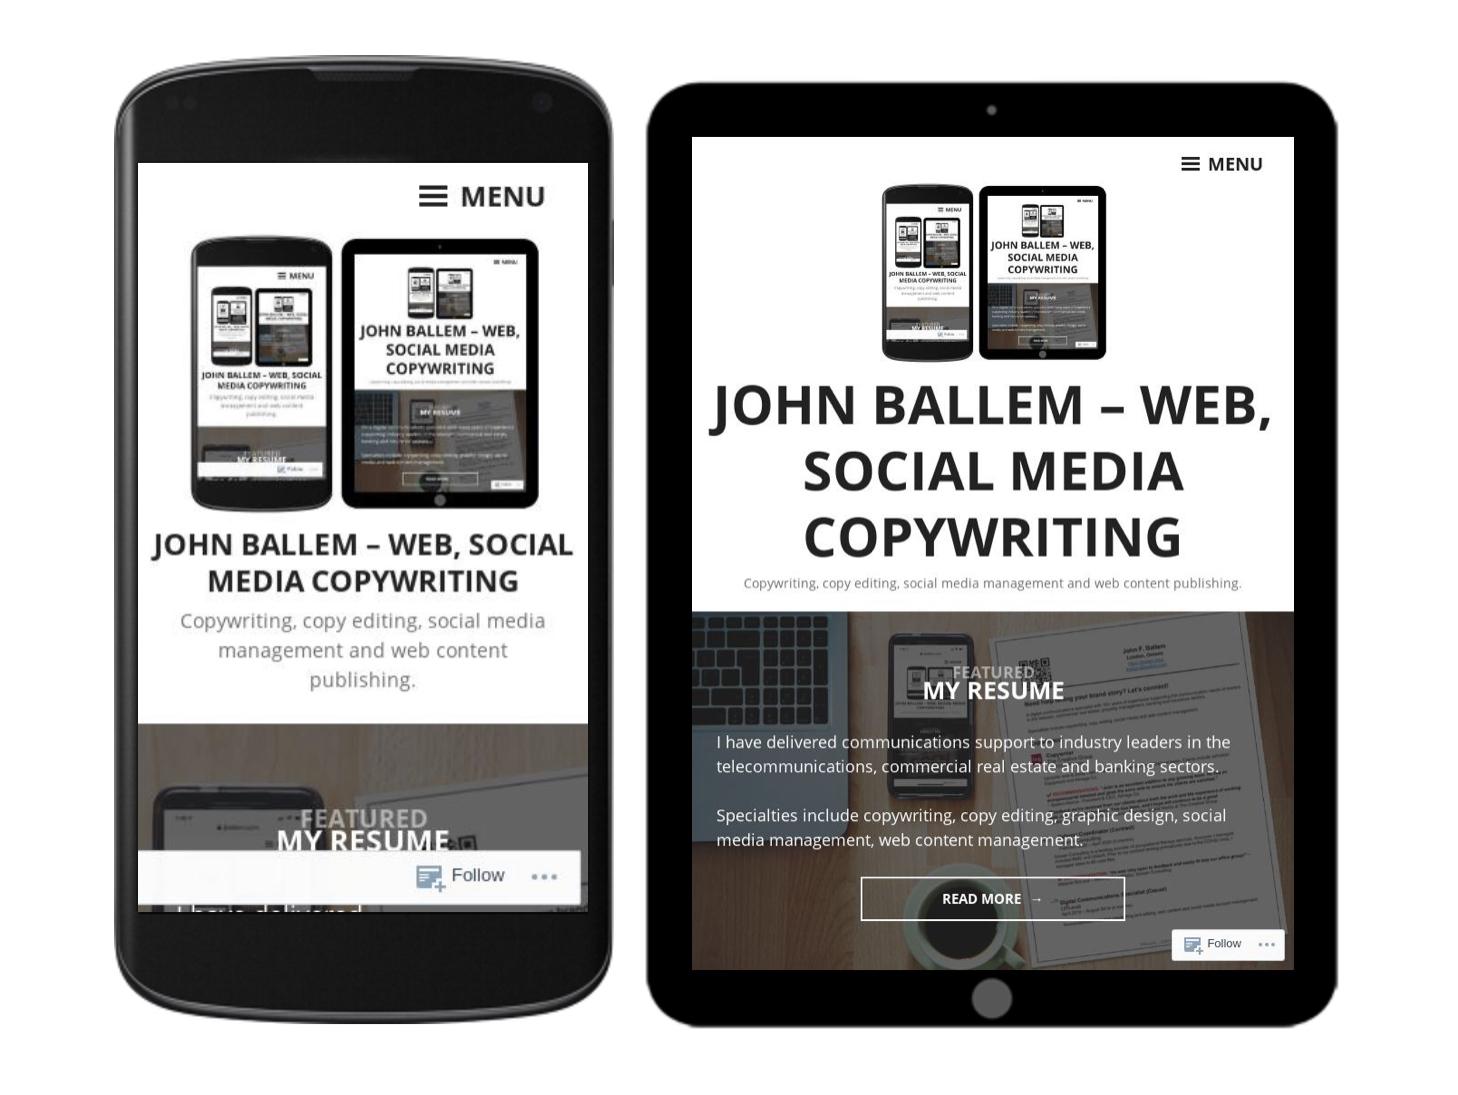 John Ballem – Web, Social Media Copywriting